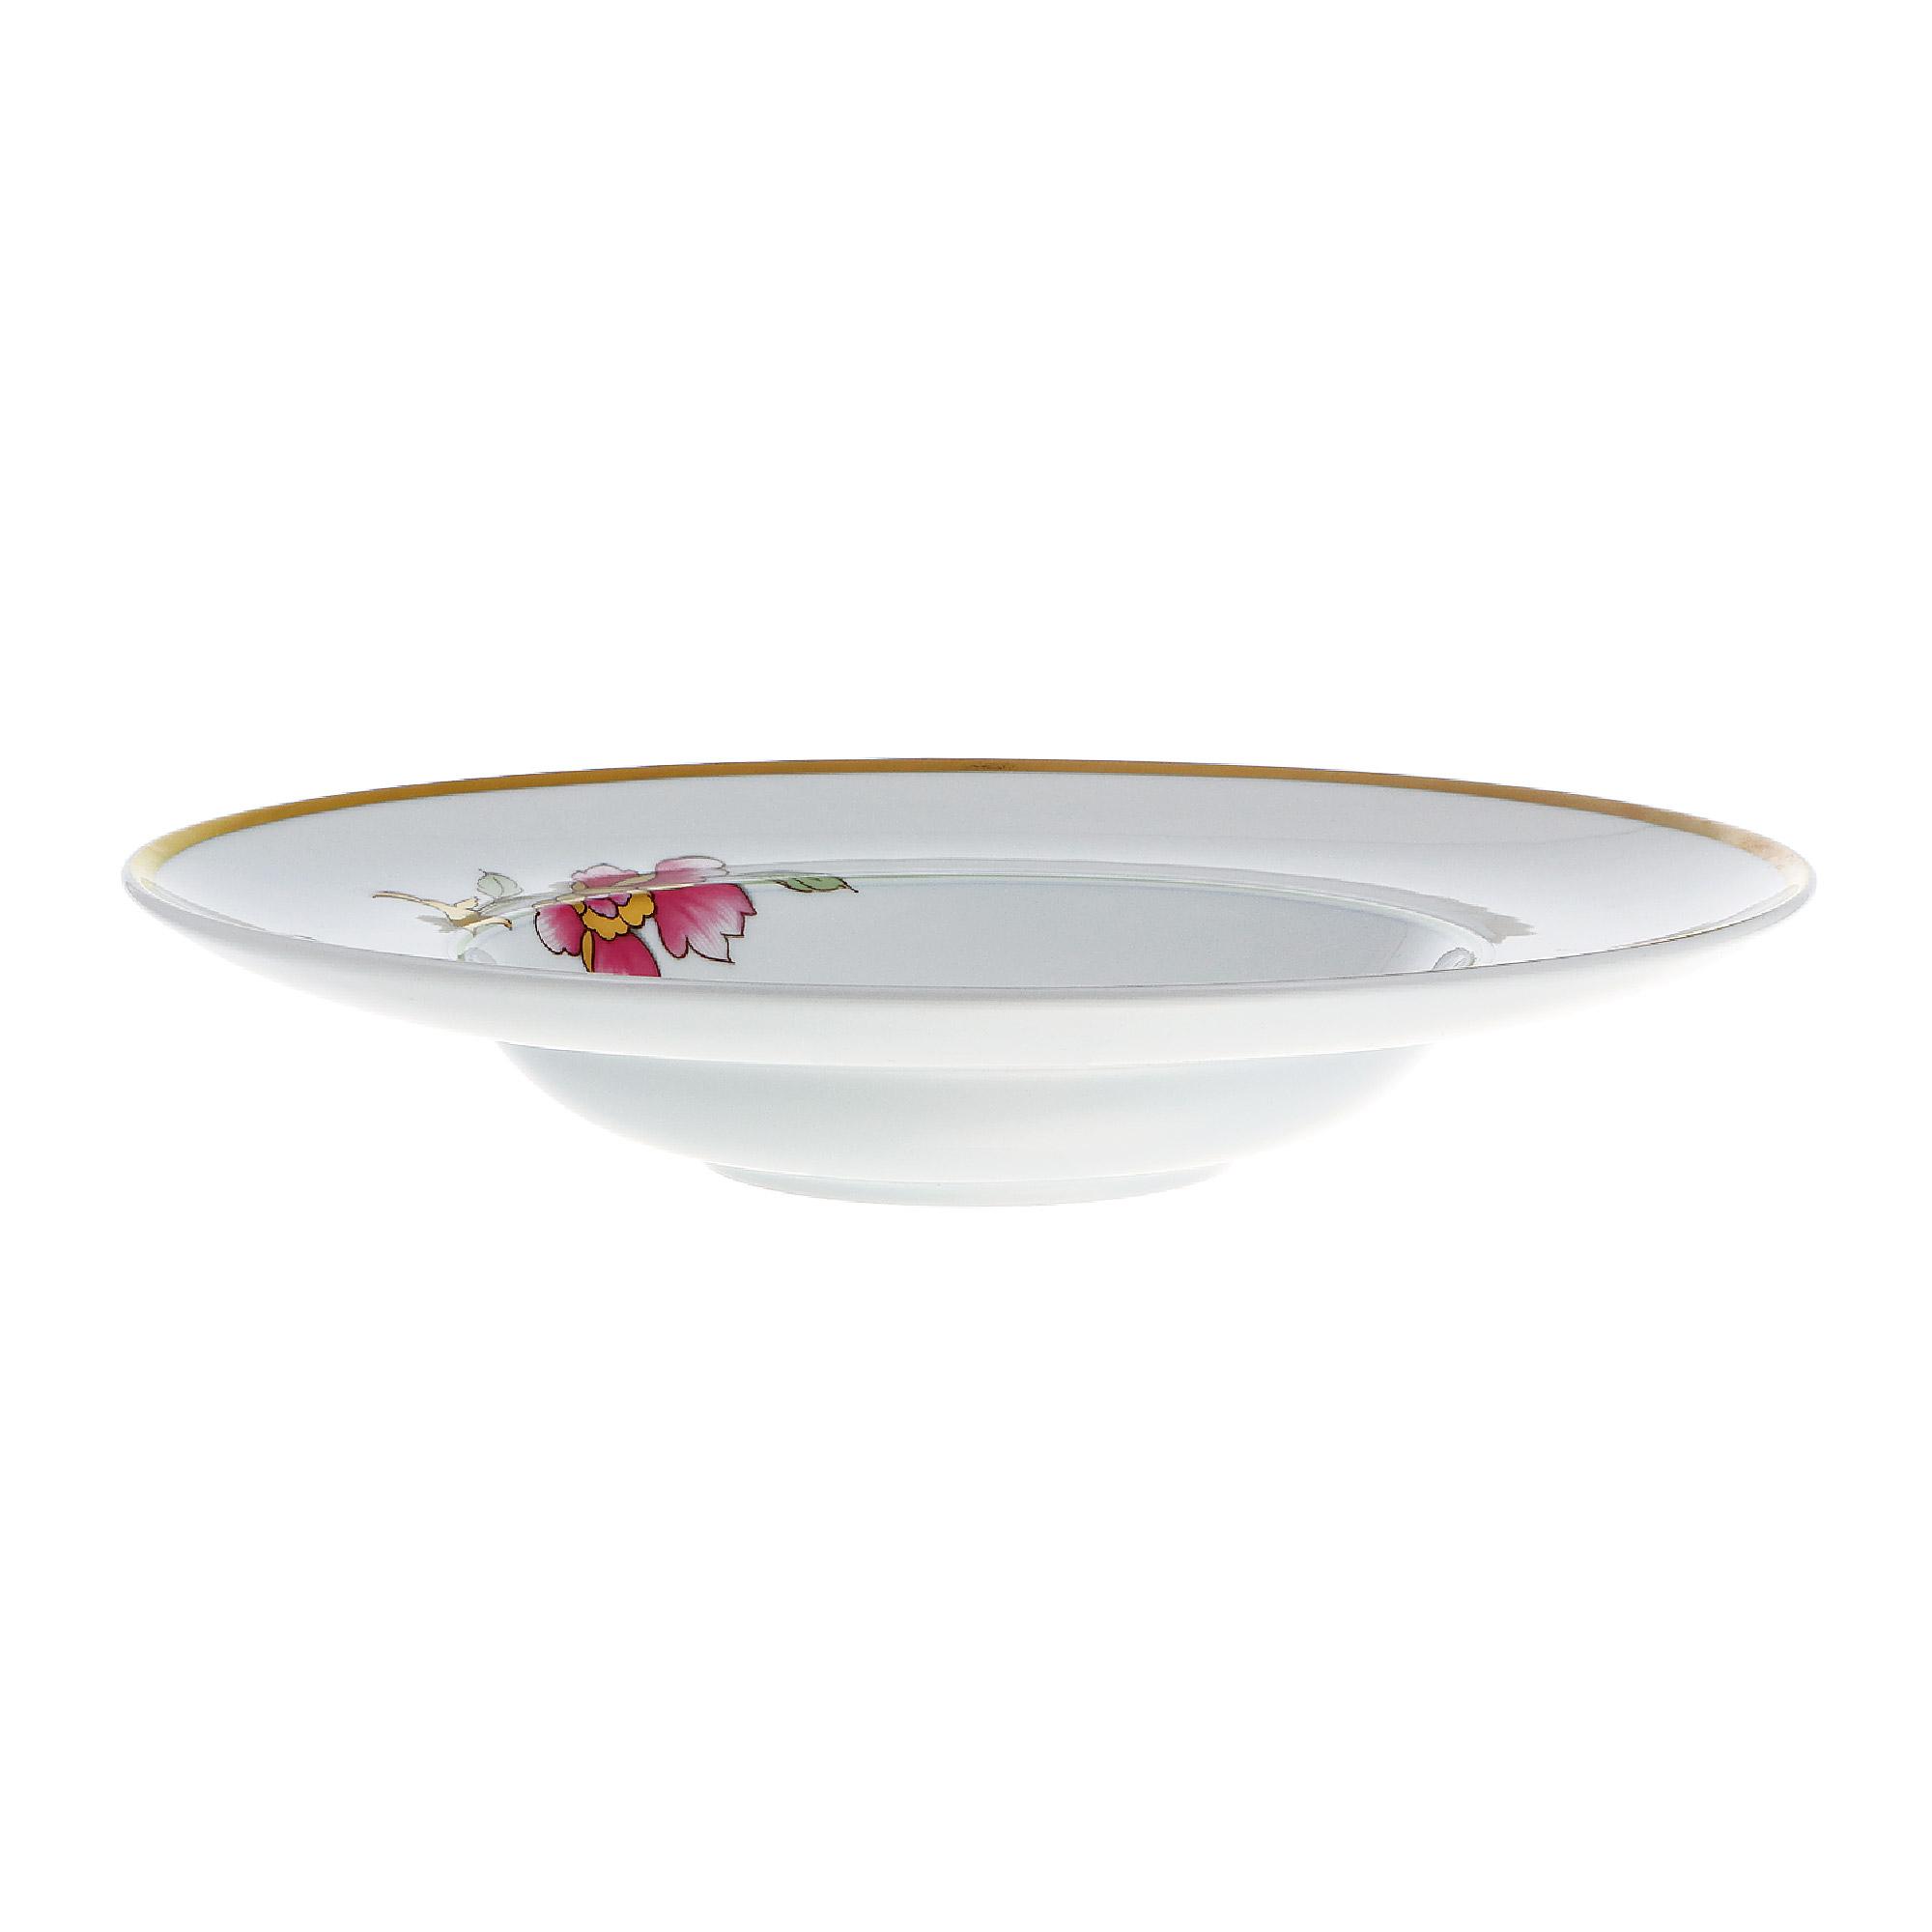 Тарелка суповая Vista alegre авалон фото